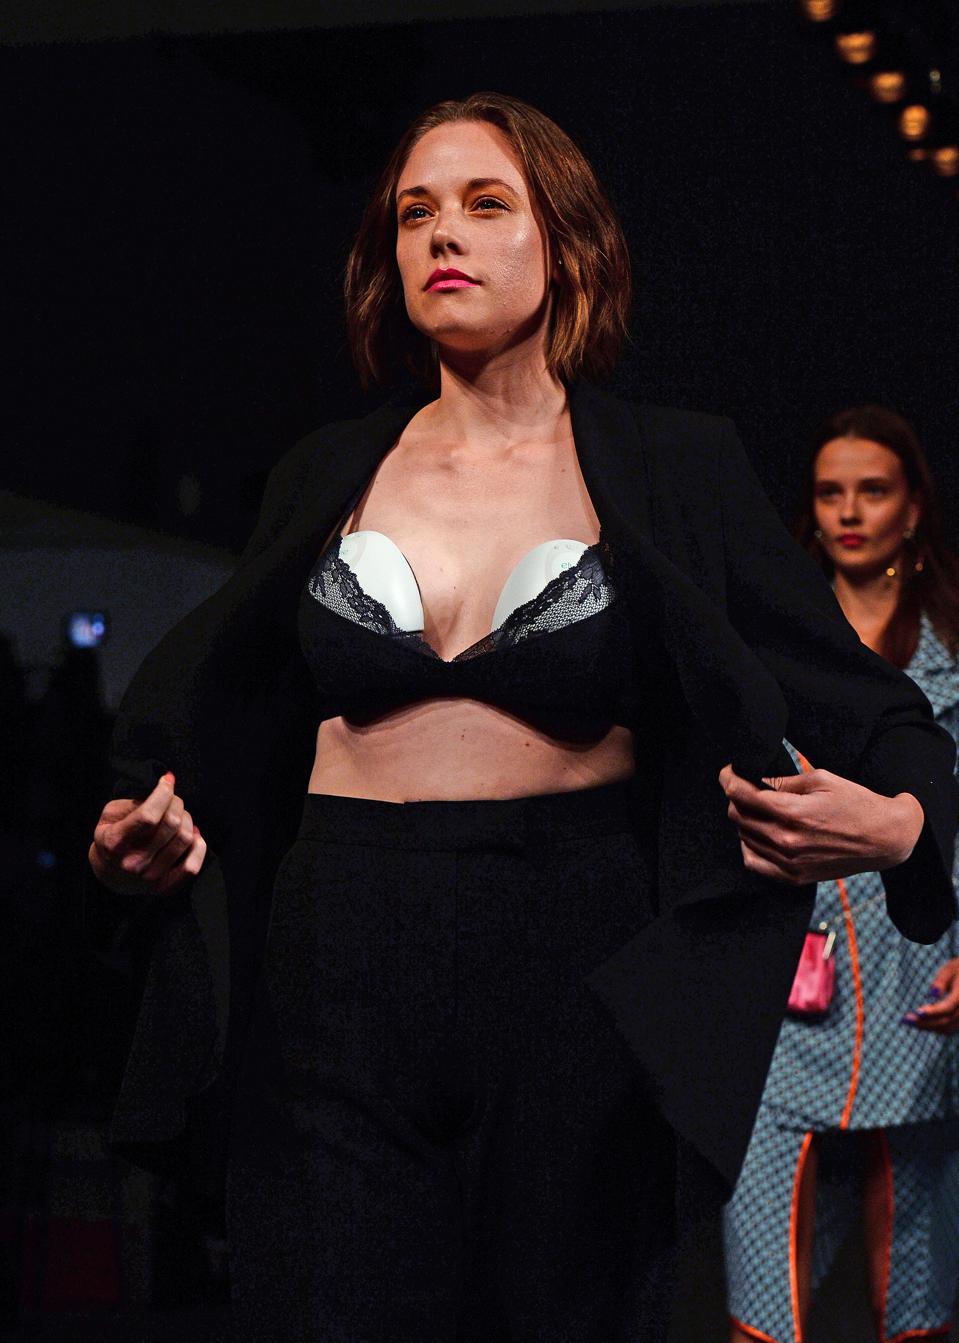 Marta Jakubowski SS19 Show Featuring Elvie